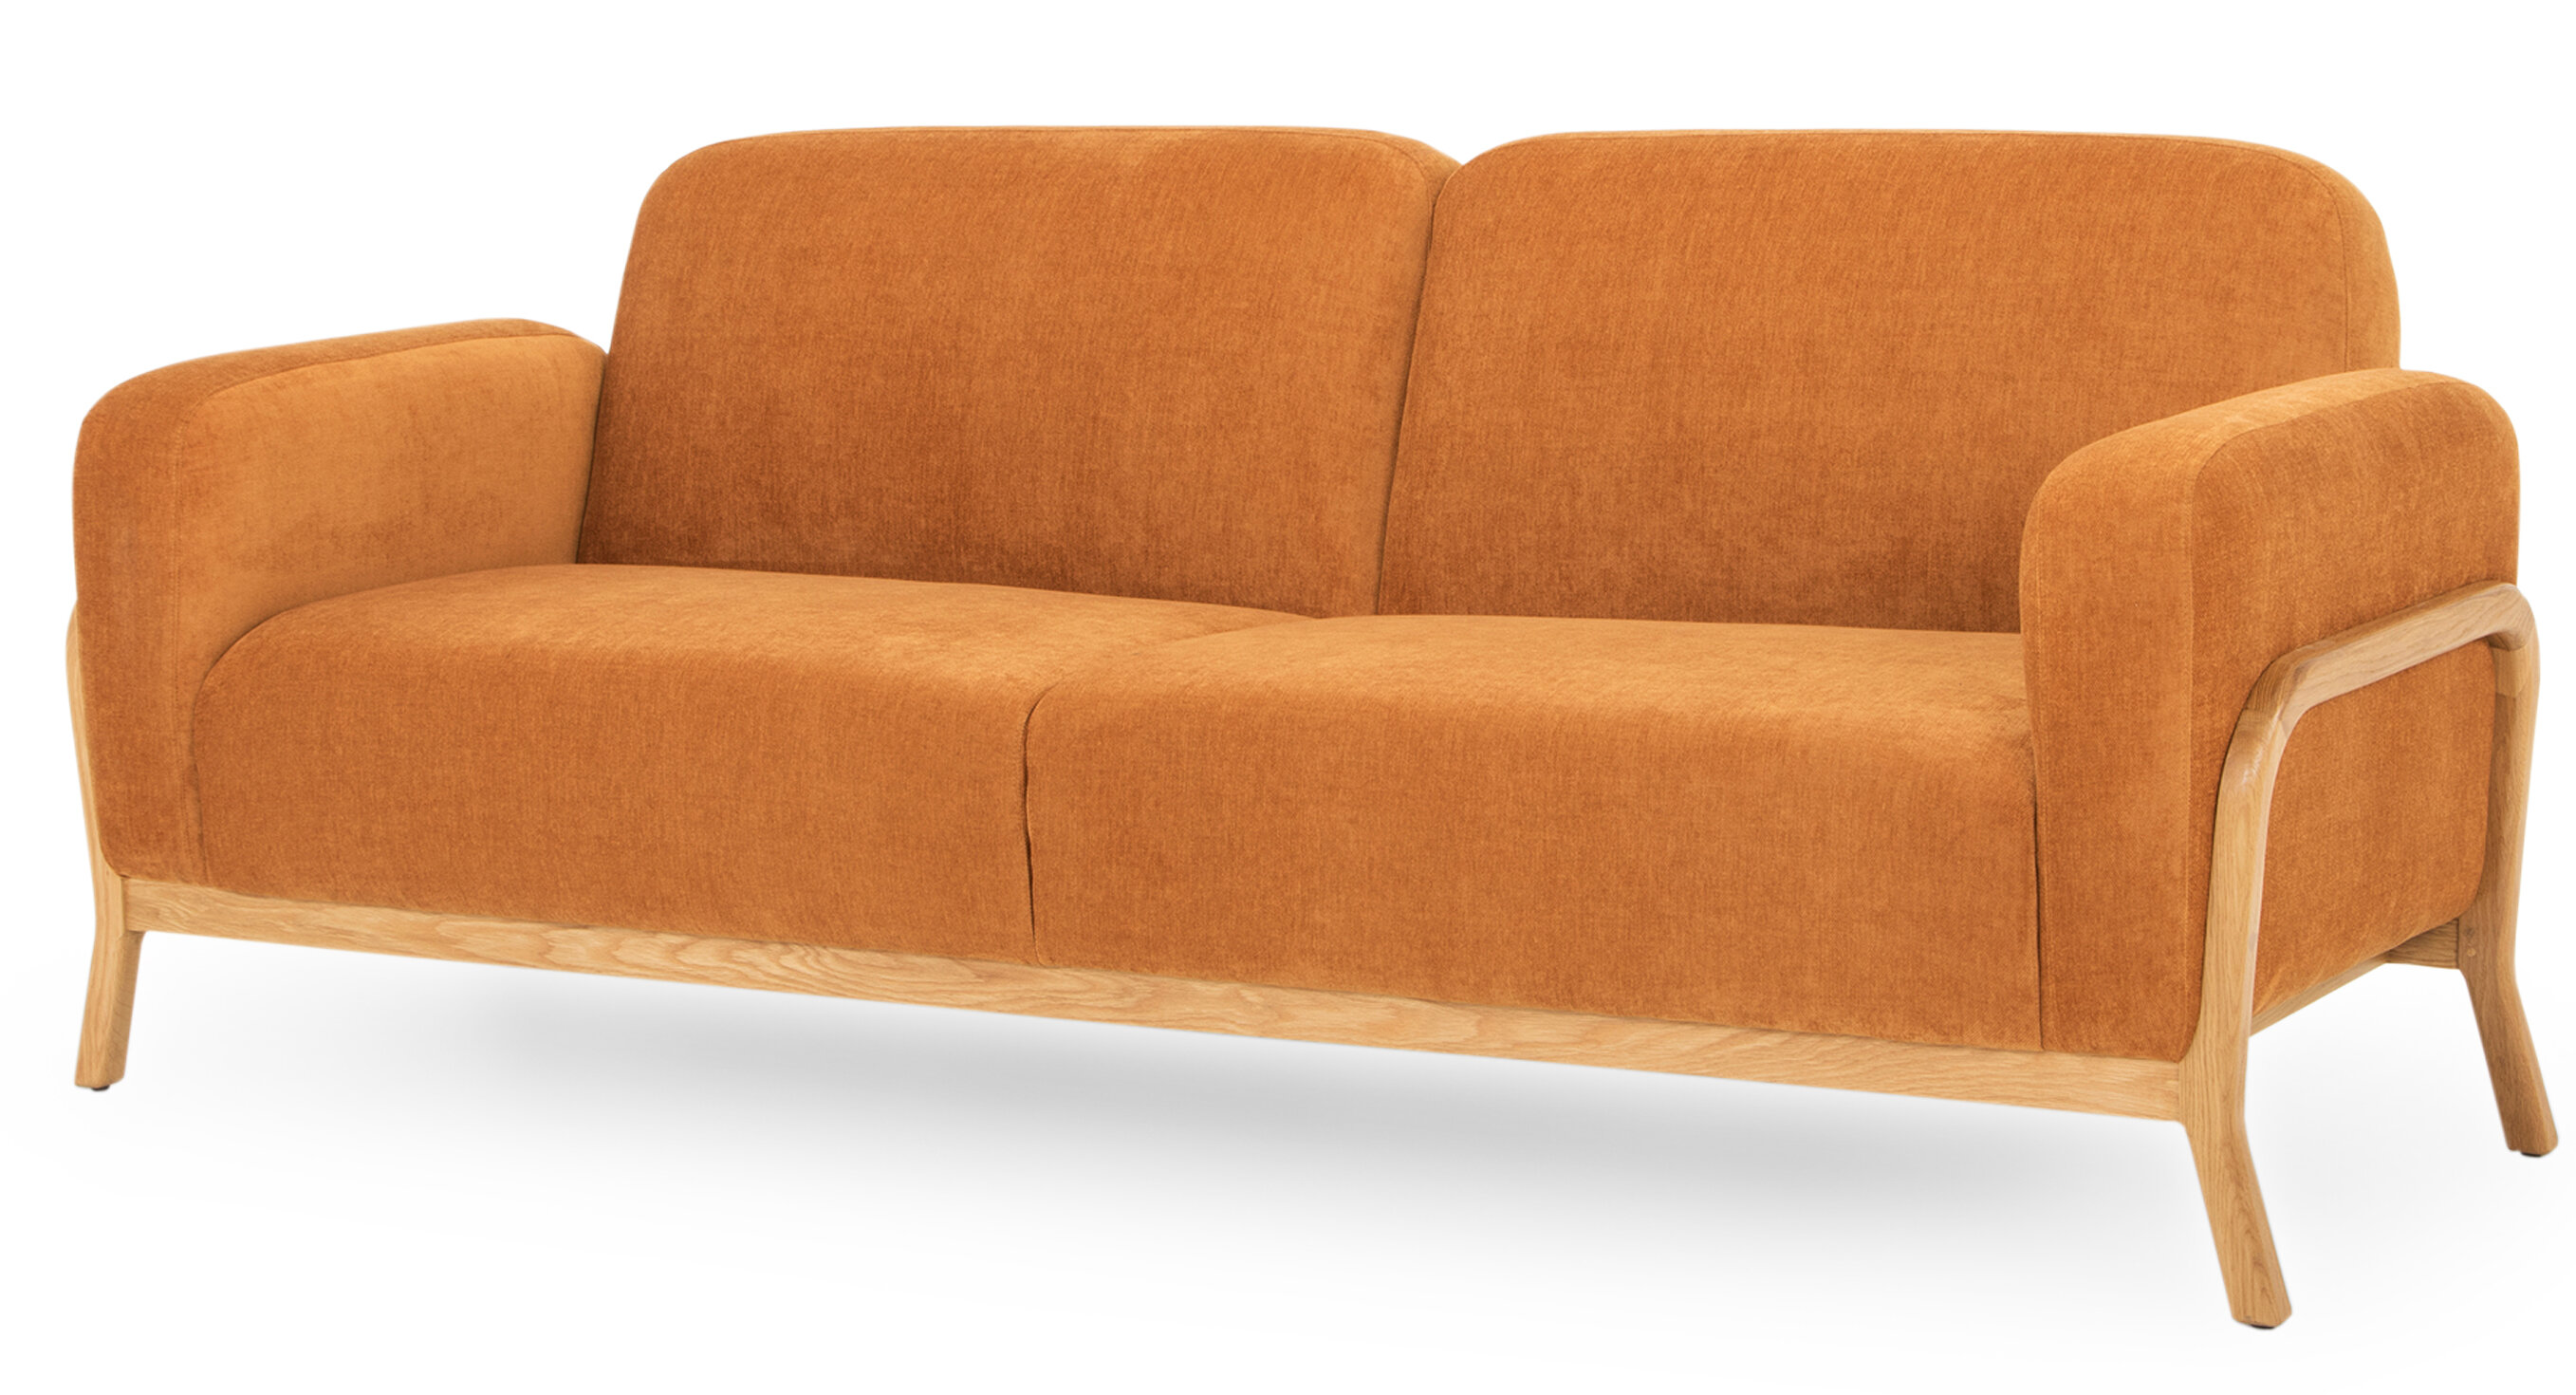 Morgana Platform Bed Sofas You Ll Love In 2021 Wayfair